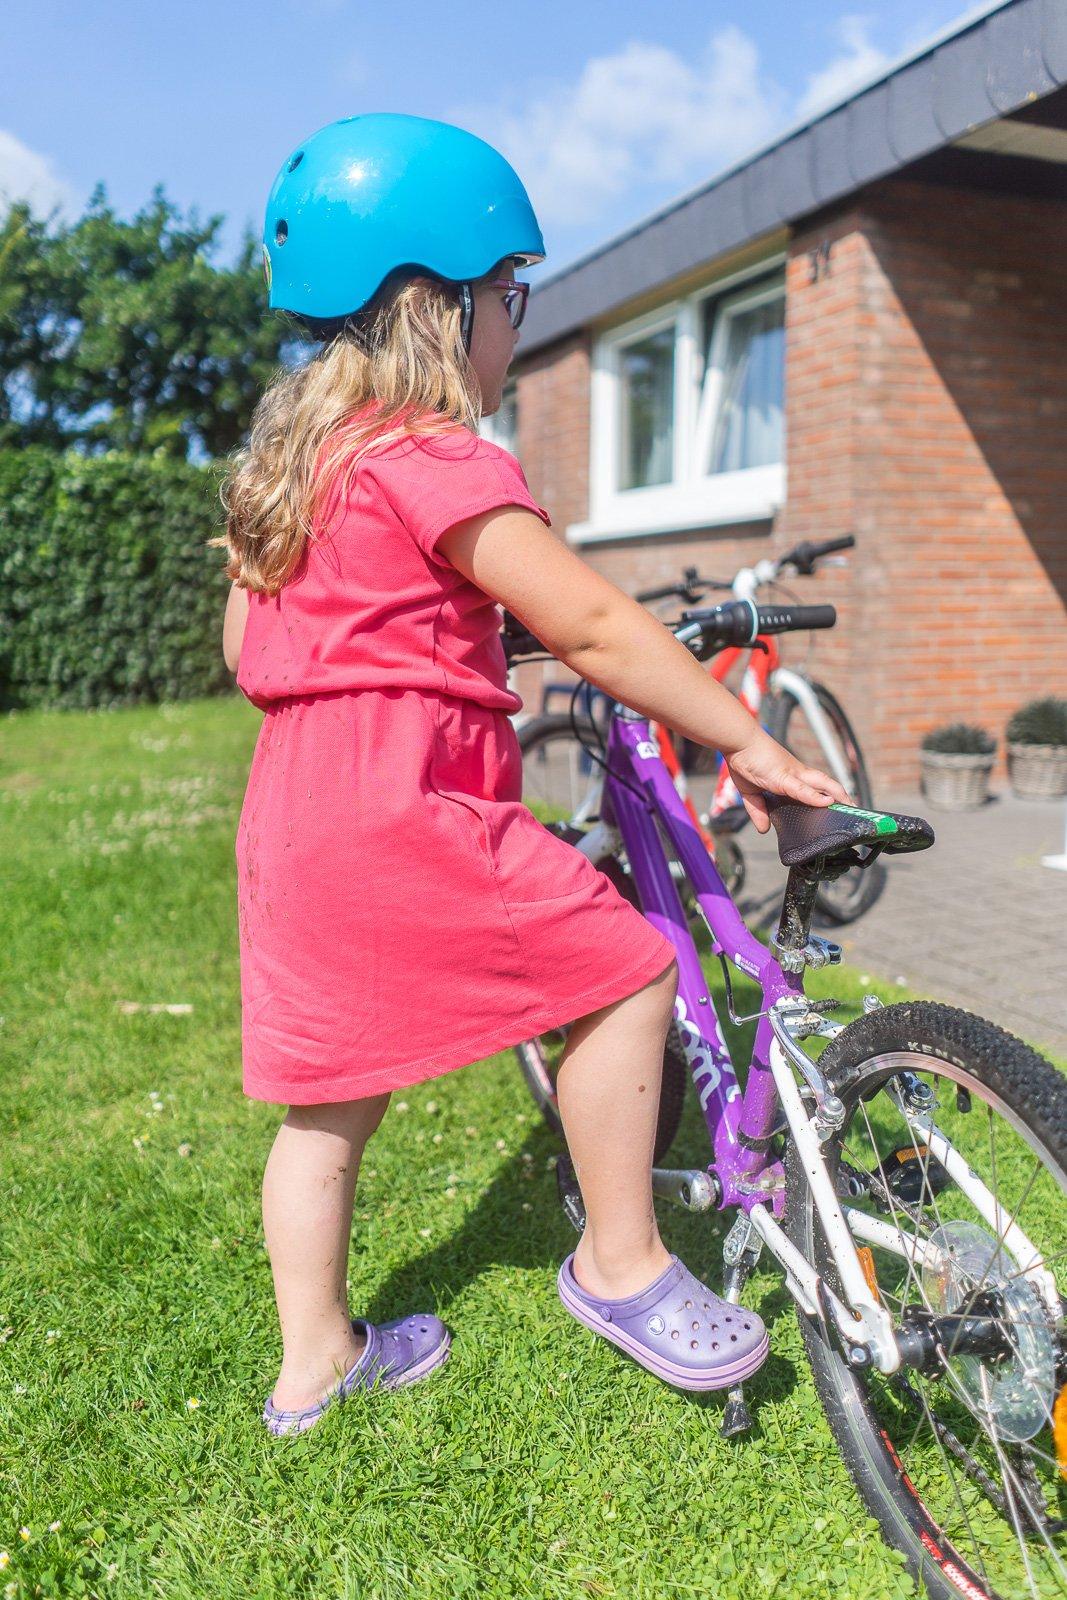 Fahrradhelm lebenswichtig